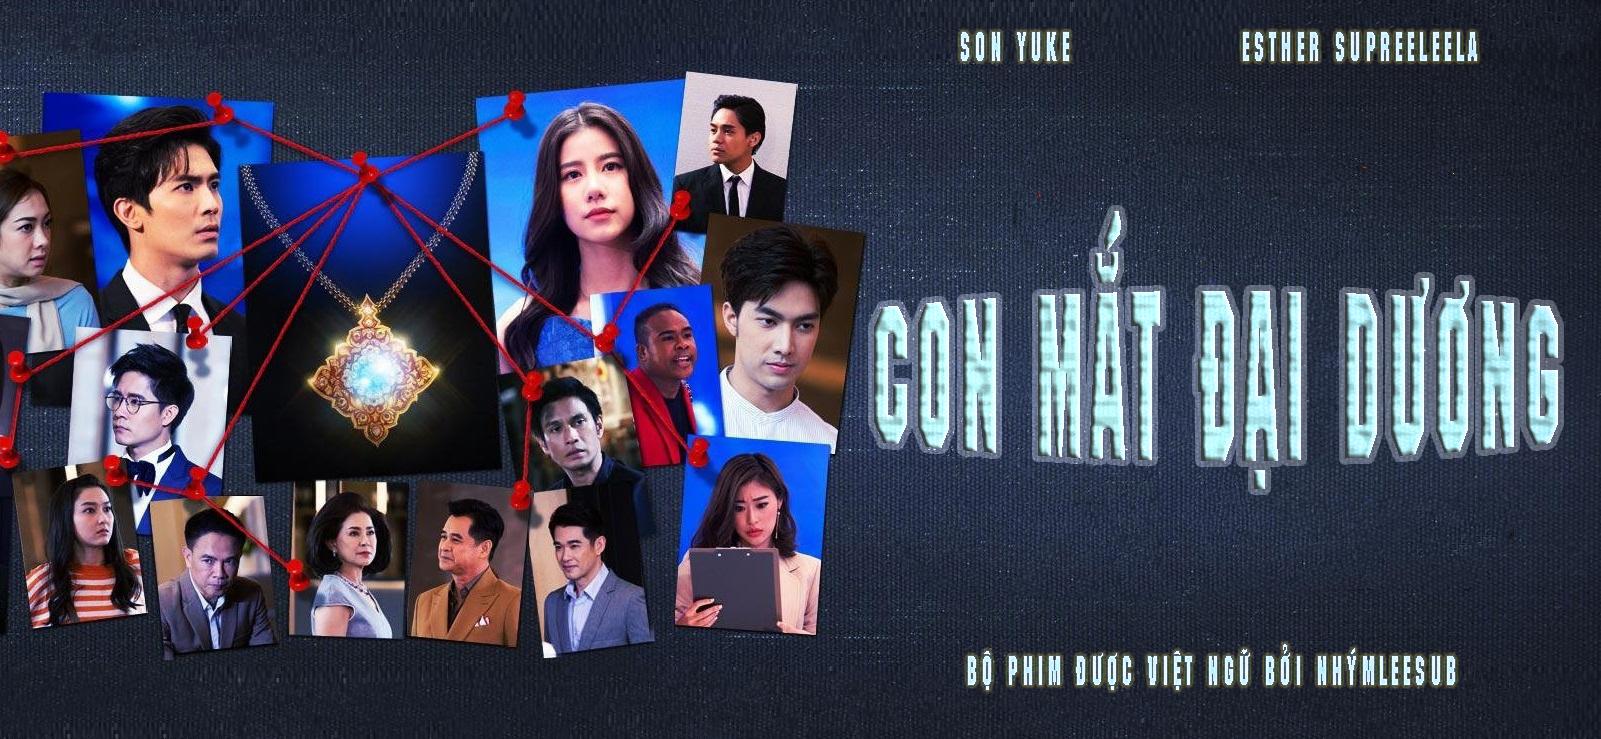 [Thailand Drama 2020] Neth mahunnop / Con mắt đại dương – Son Yuke, Esther Supreeleela (EP.09 Updated – END)